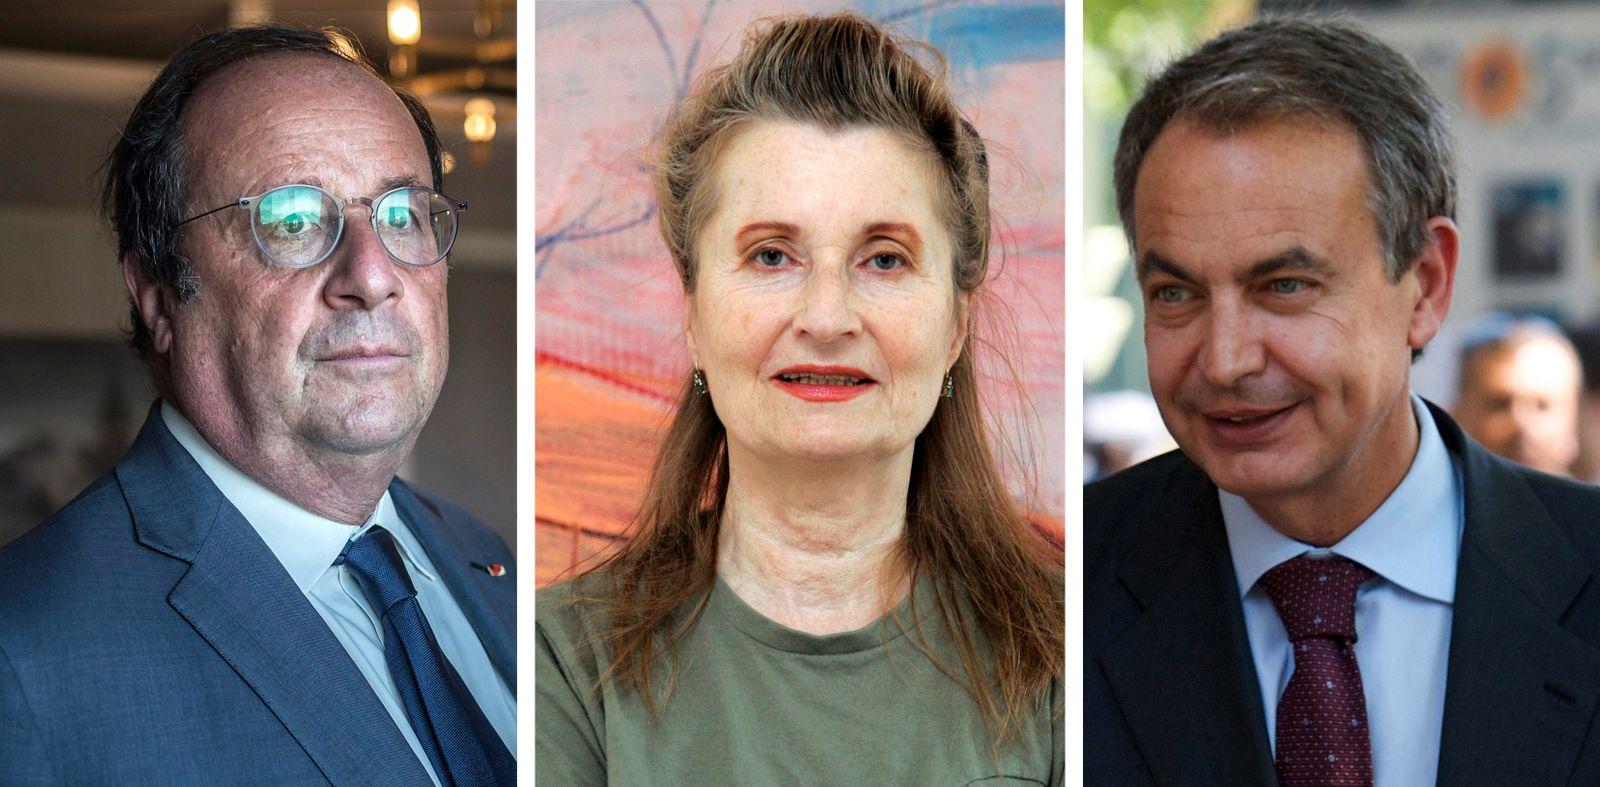 rancois Hollande, Zapatero, Elfriede Jelinek